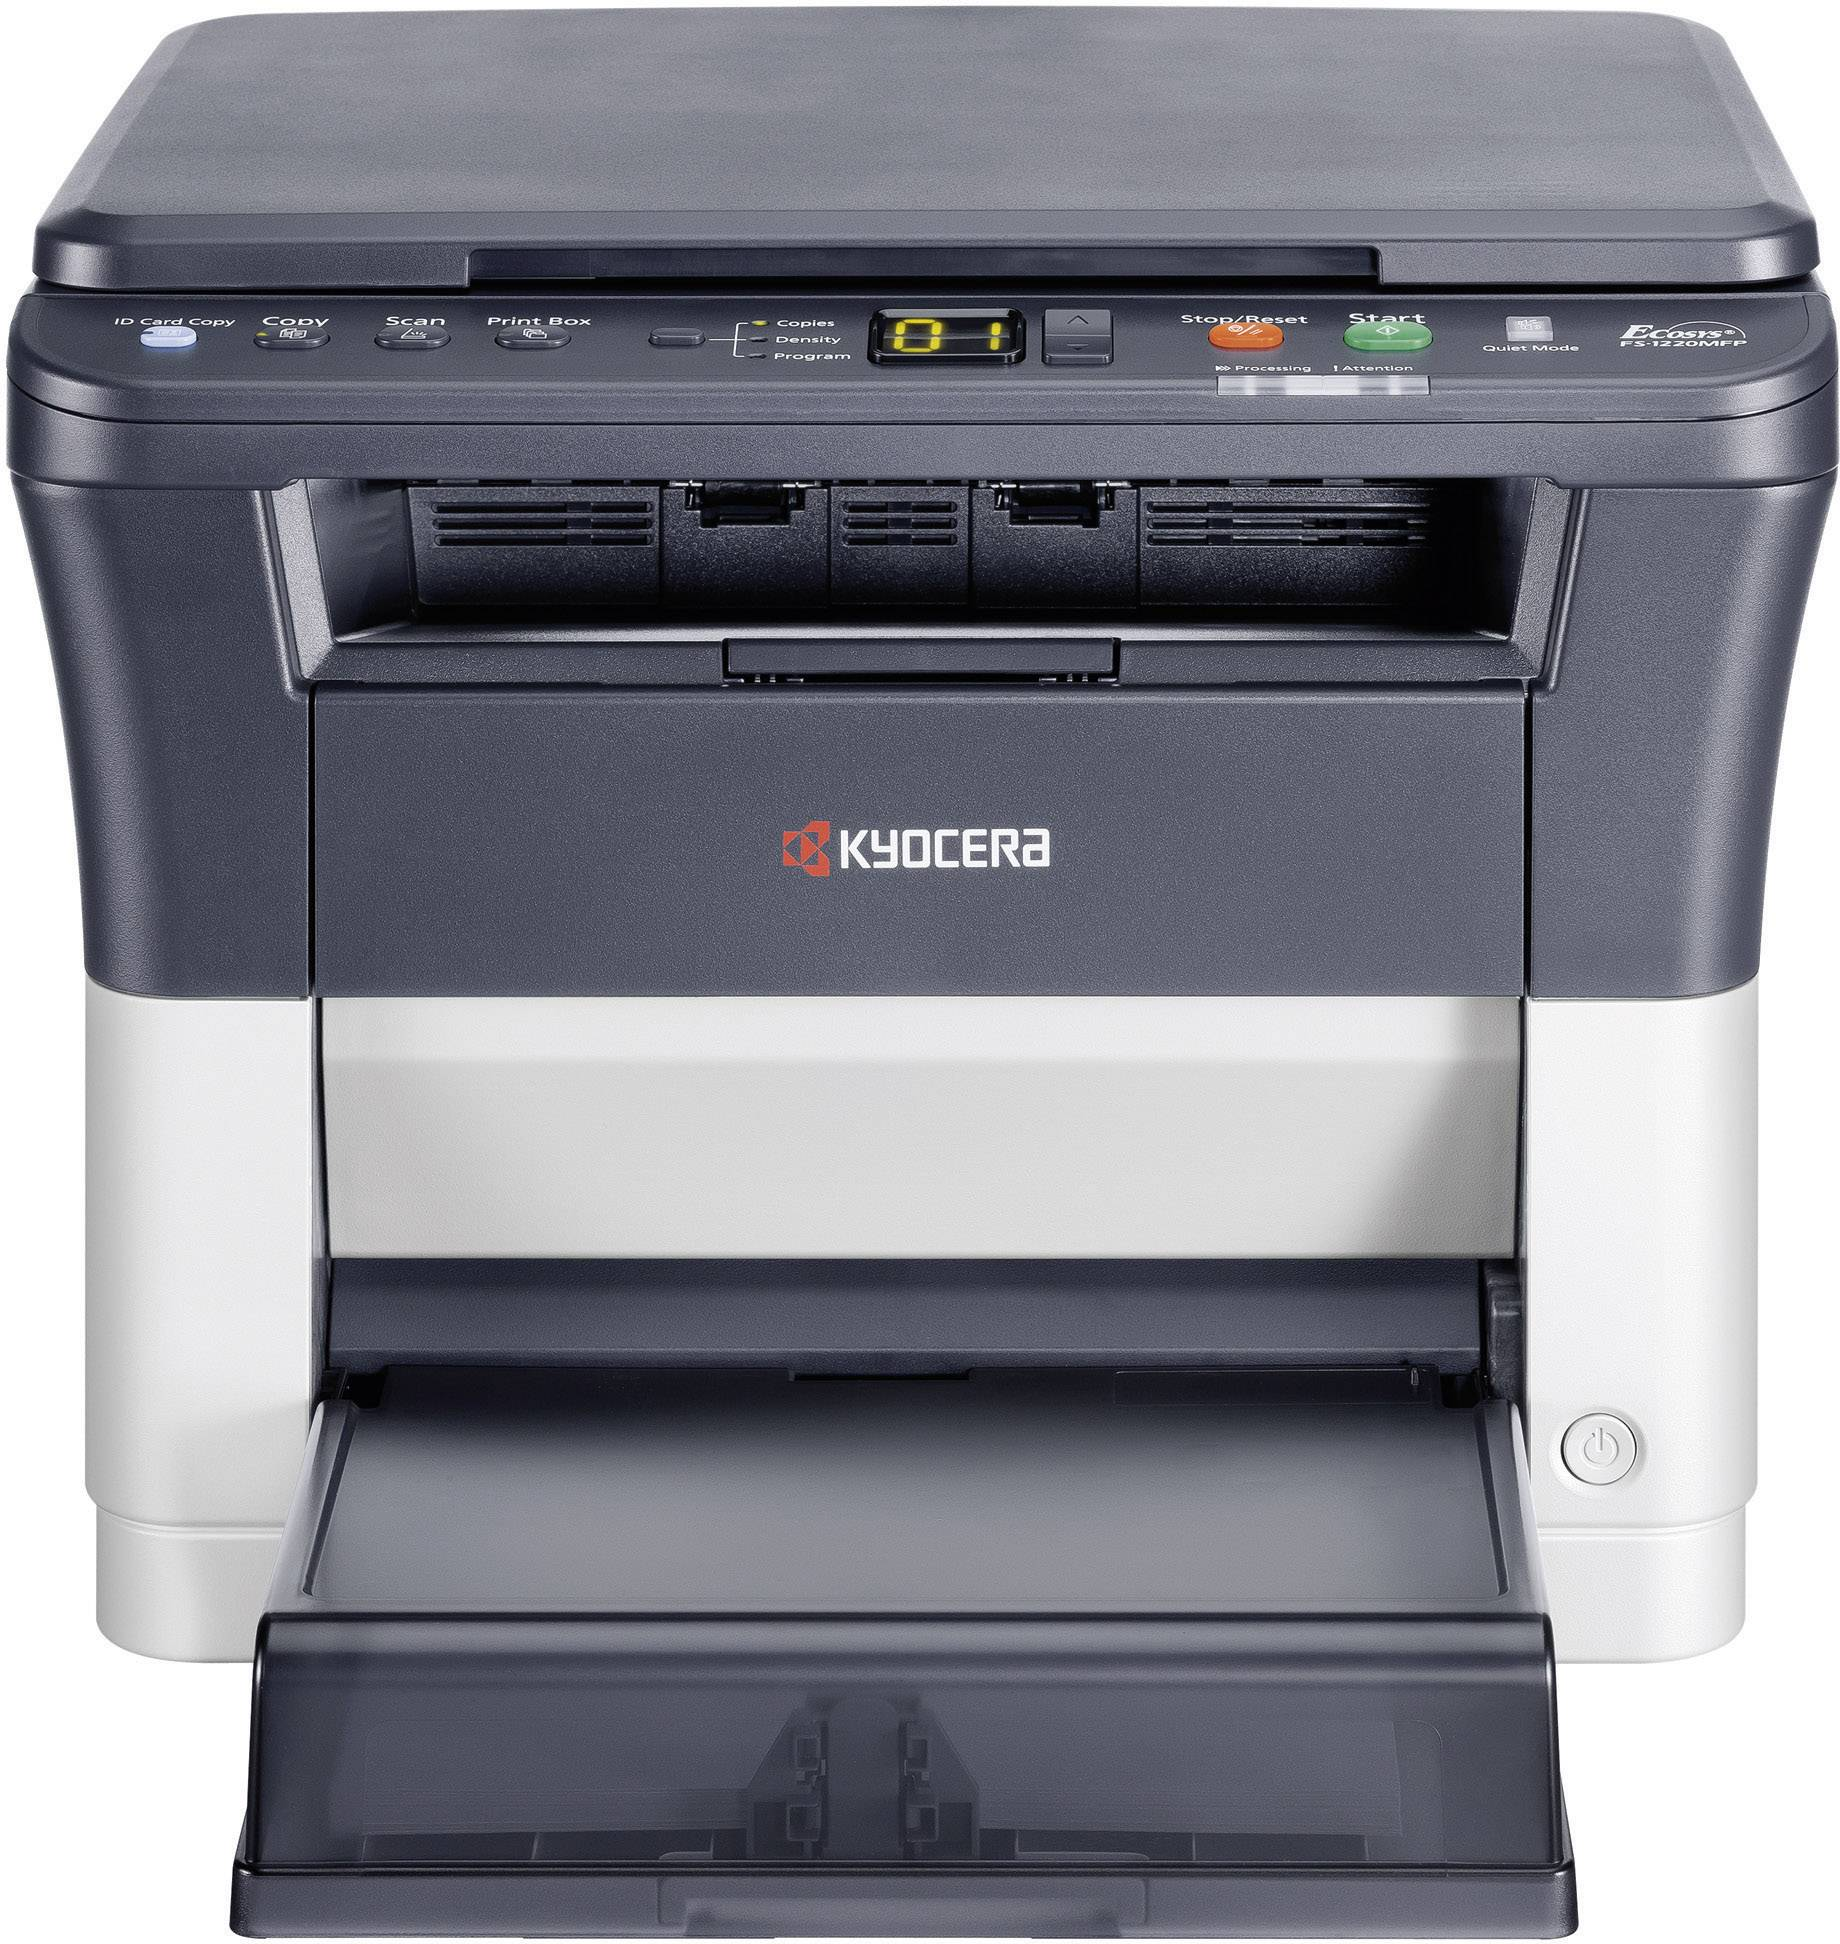 Kyocera FS-1220MFP Mono laser multifunction printer A4